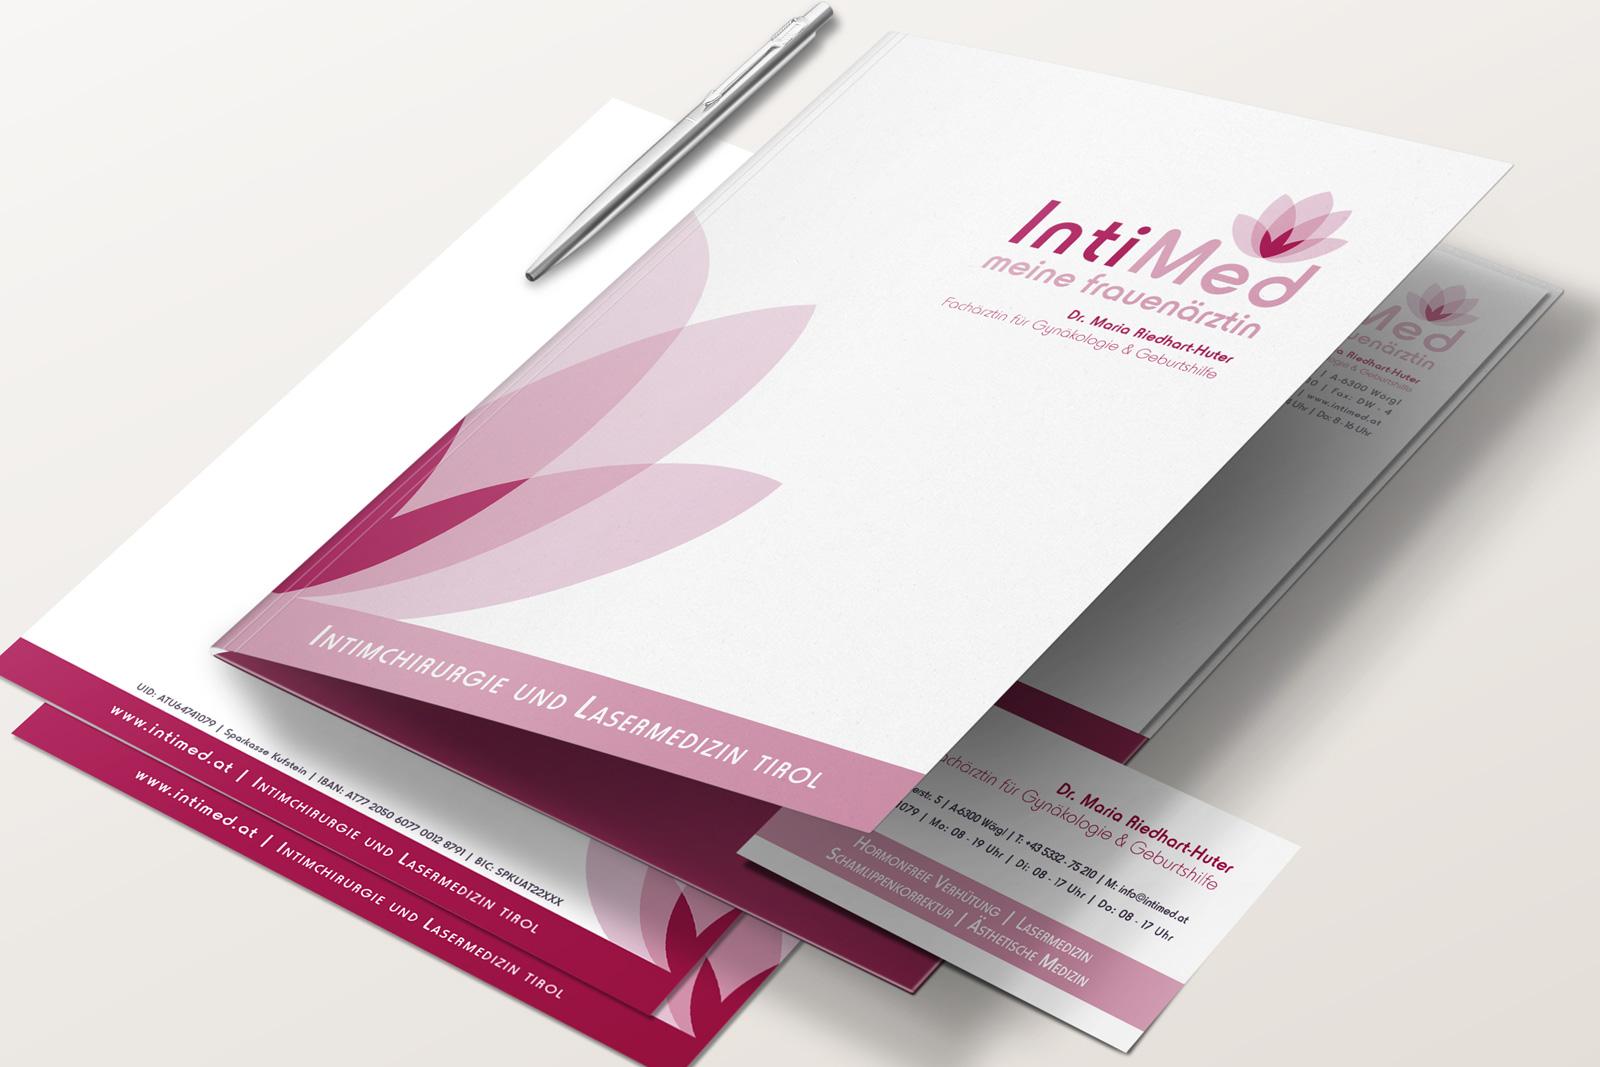 agentur 13   Werbeagentur Tirol   intimed Webdesign